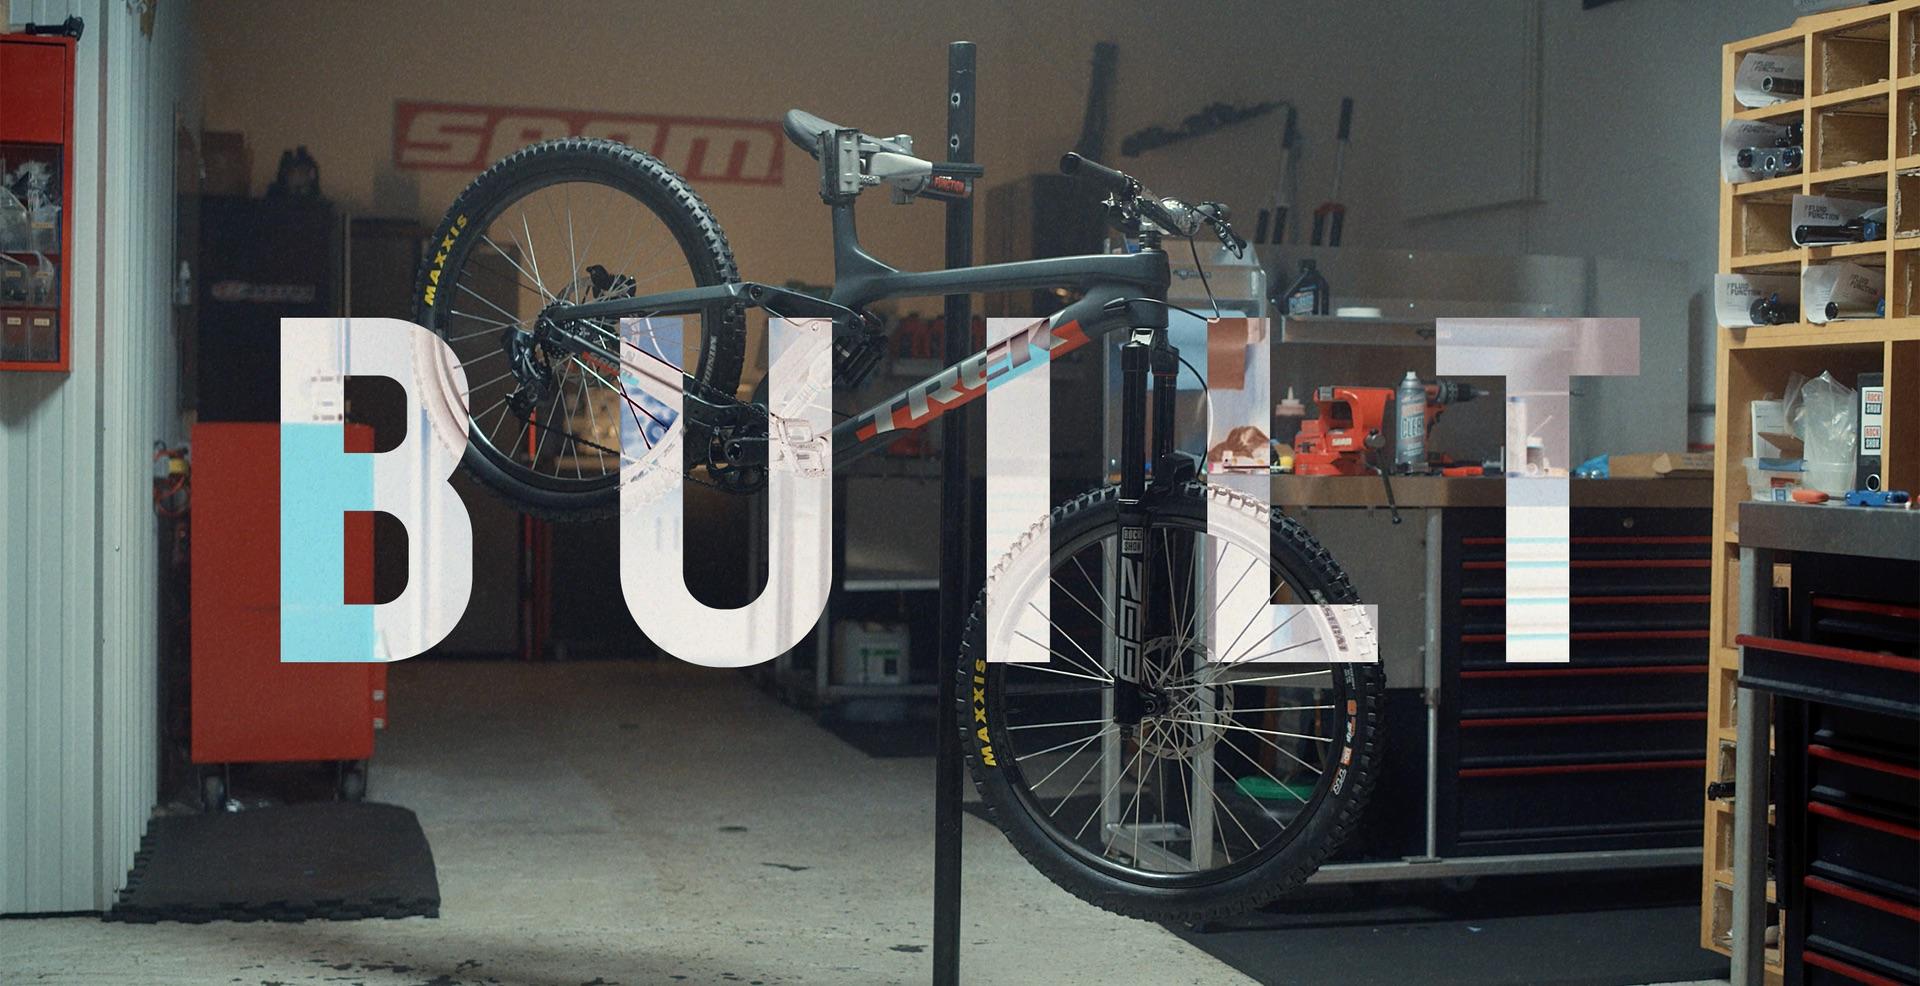 , Brandon Semenuk's Red Bull Rampage Bike